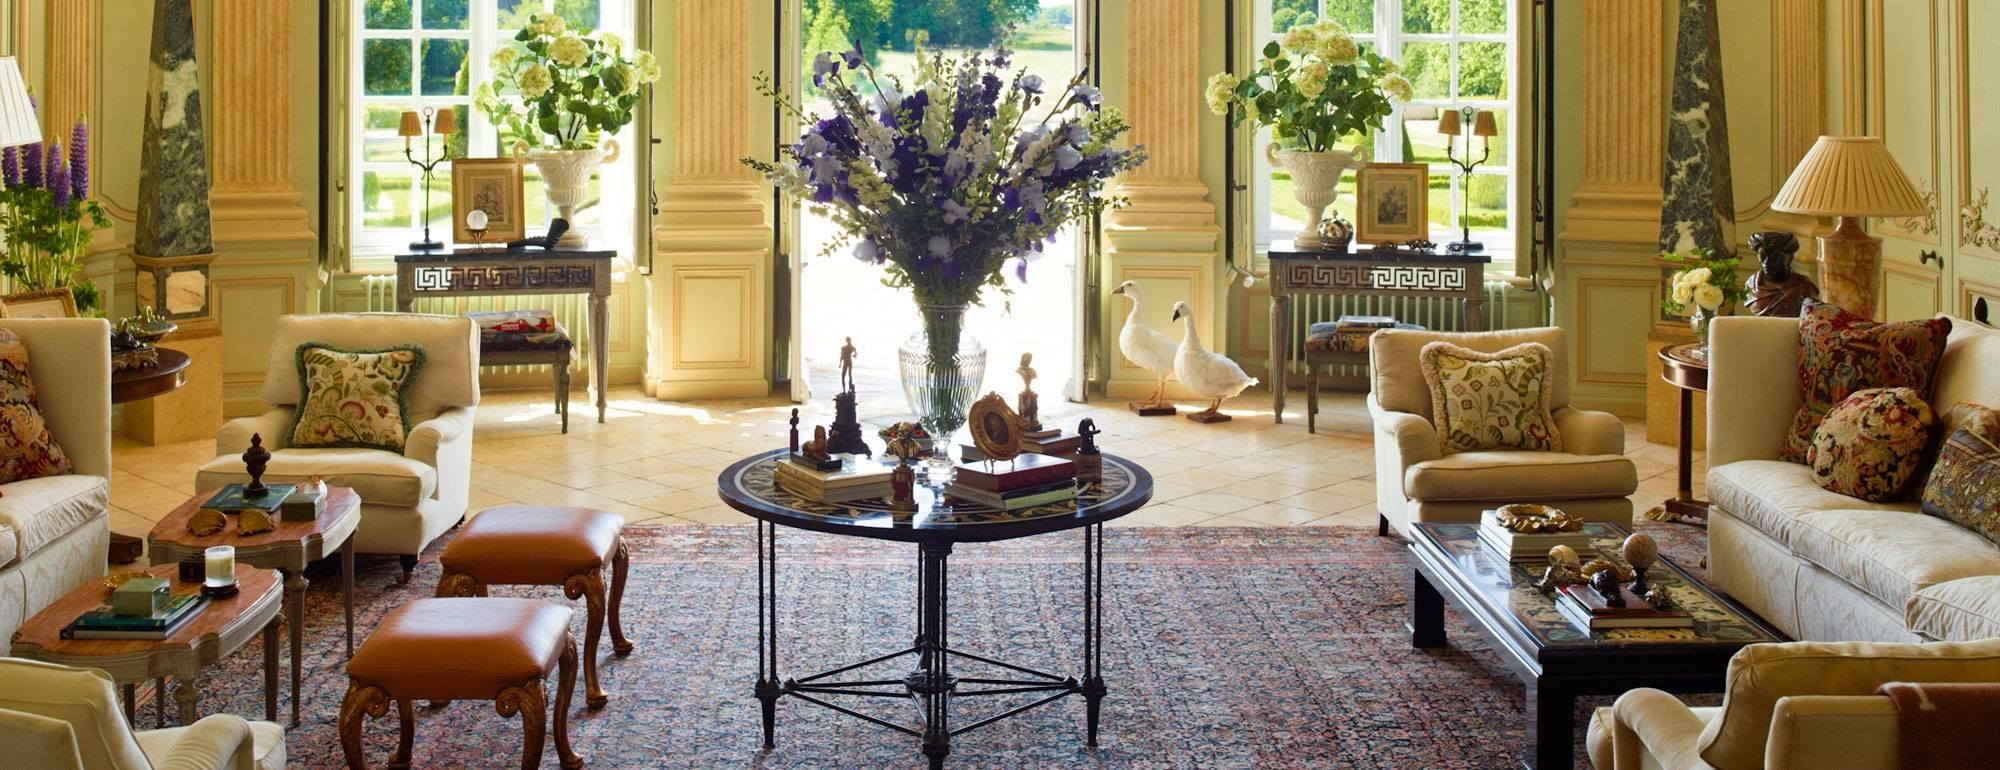 Top Interior Designer & Famous Interior Designs - Timothy ...